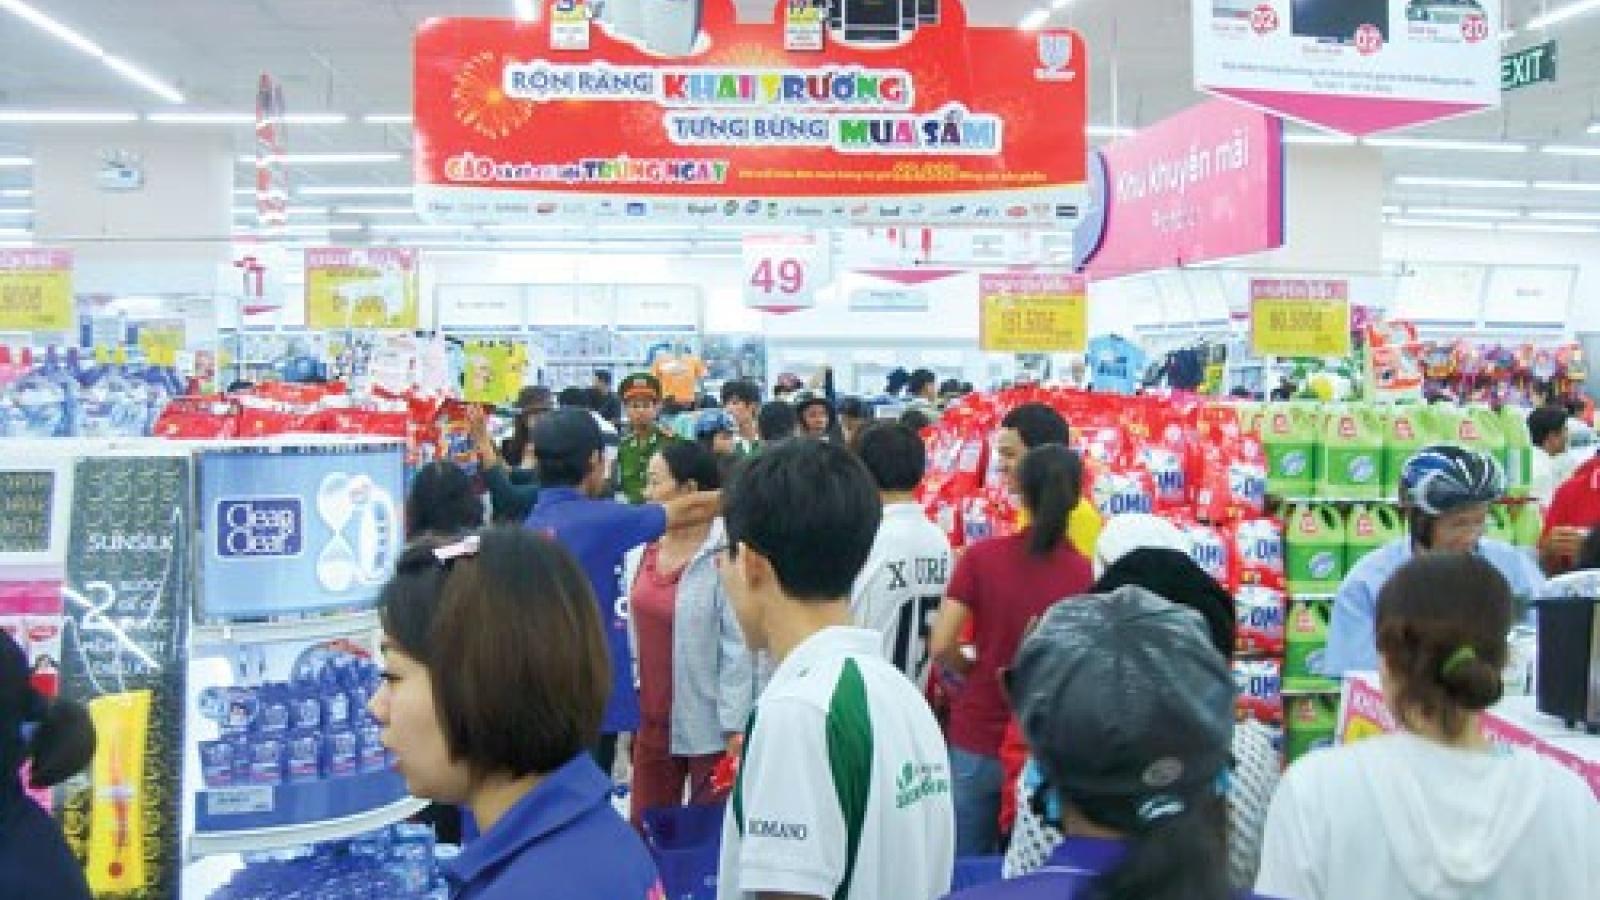 Saigon Co.op retailer expands market share